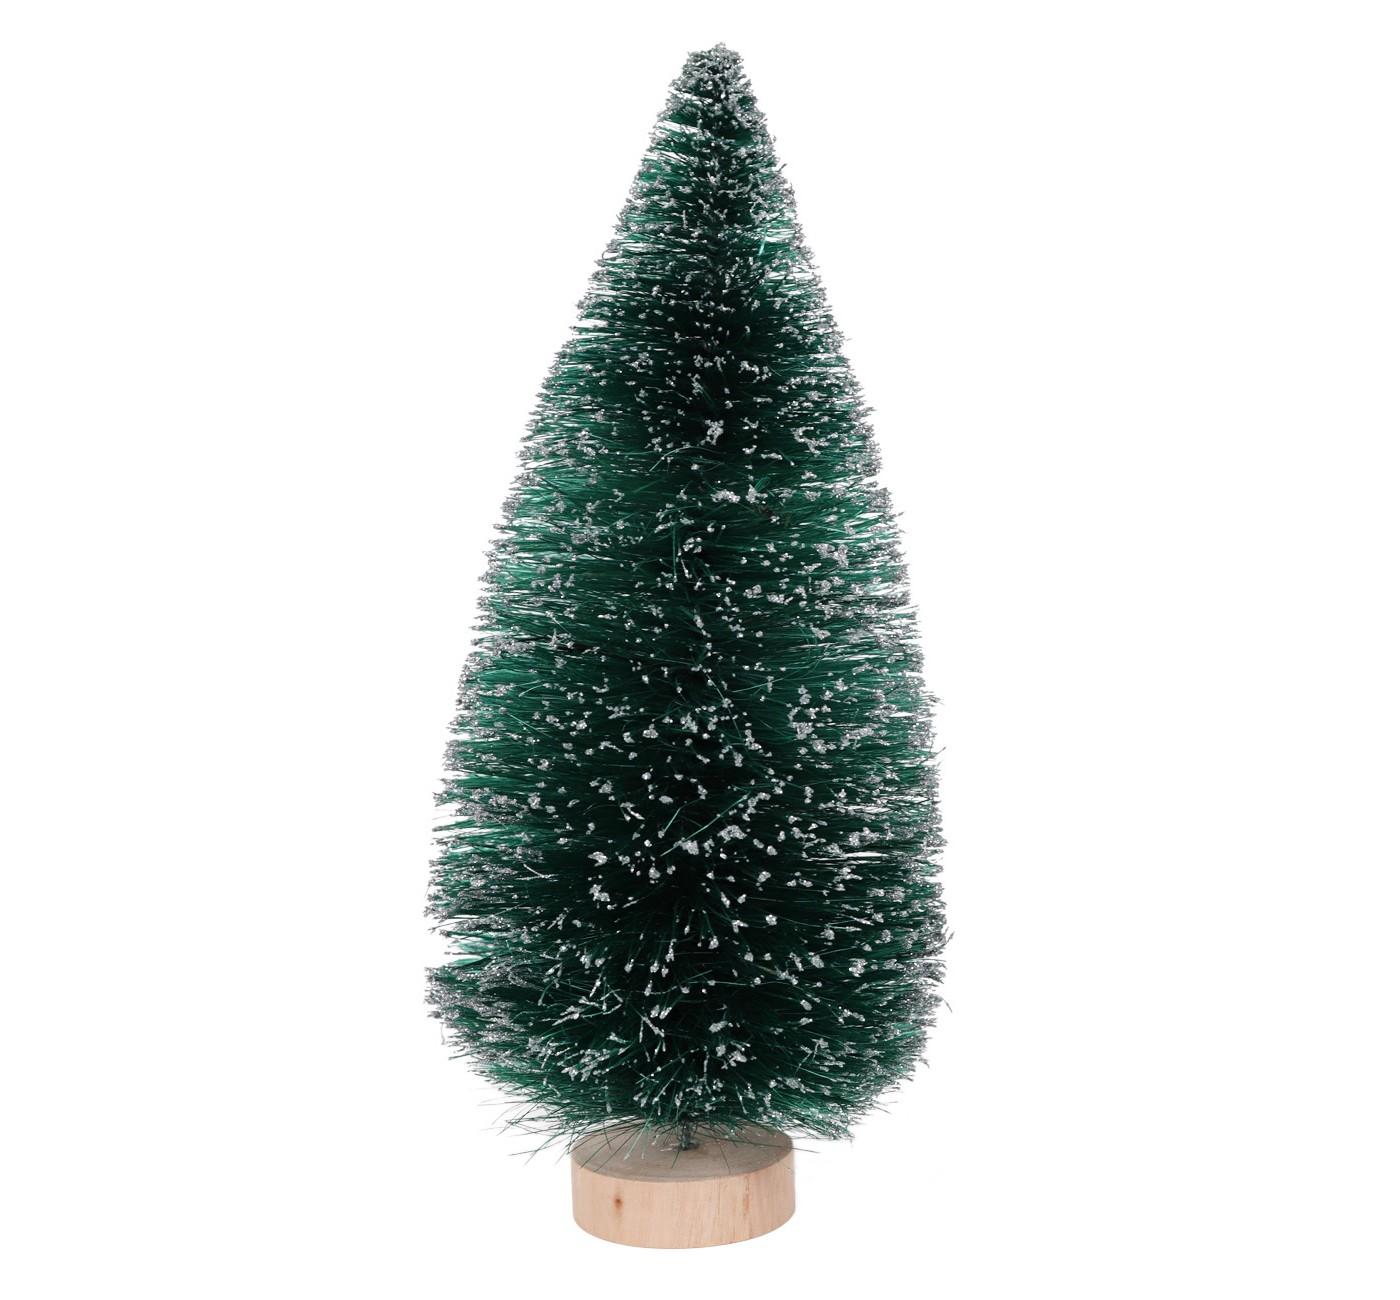 Large Bottle Brush Christmas Tree Green, $8-.jpeg